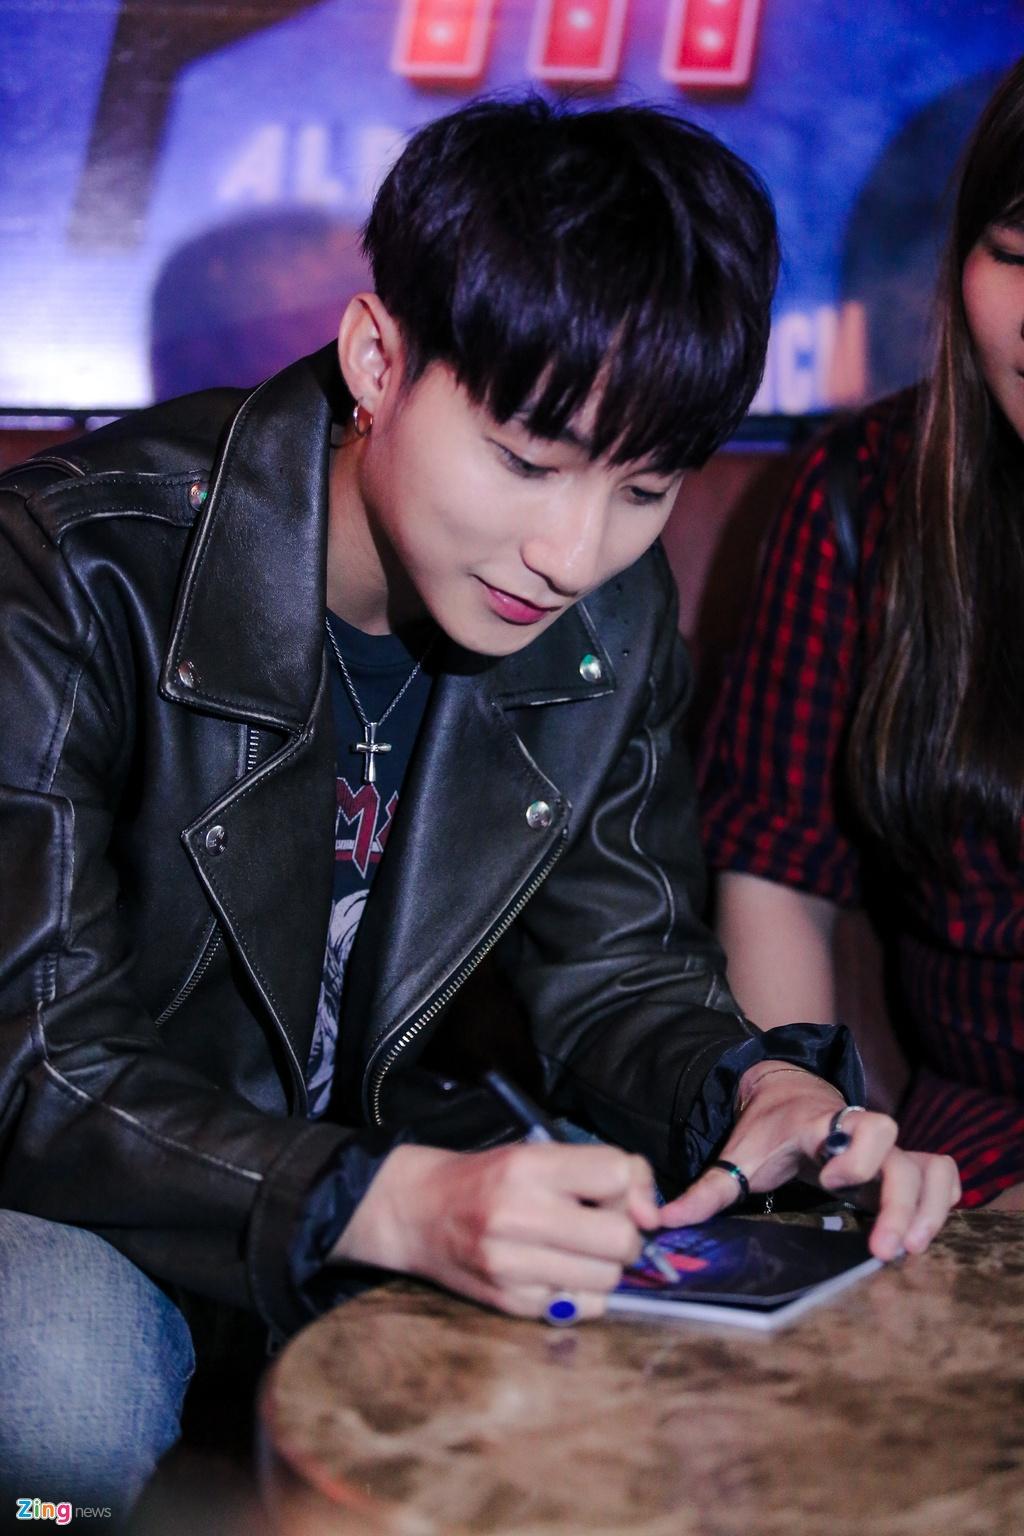 Su kien hot cua Son Tung: San khau bo khong, fan chay tan loan hinh anh 8